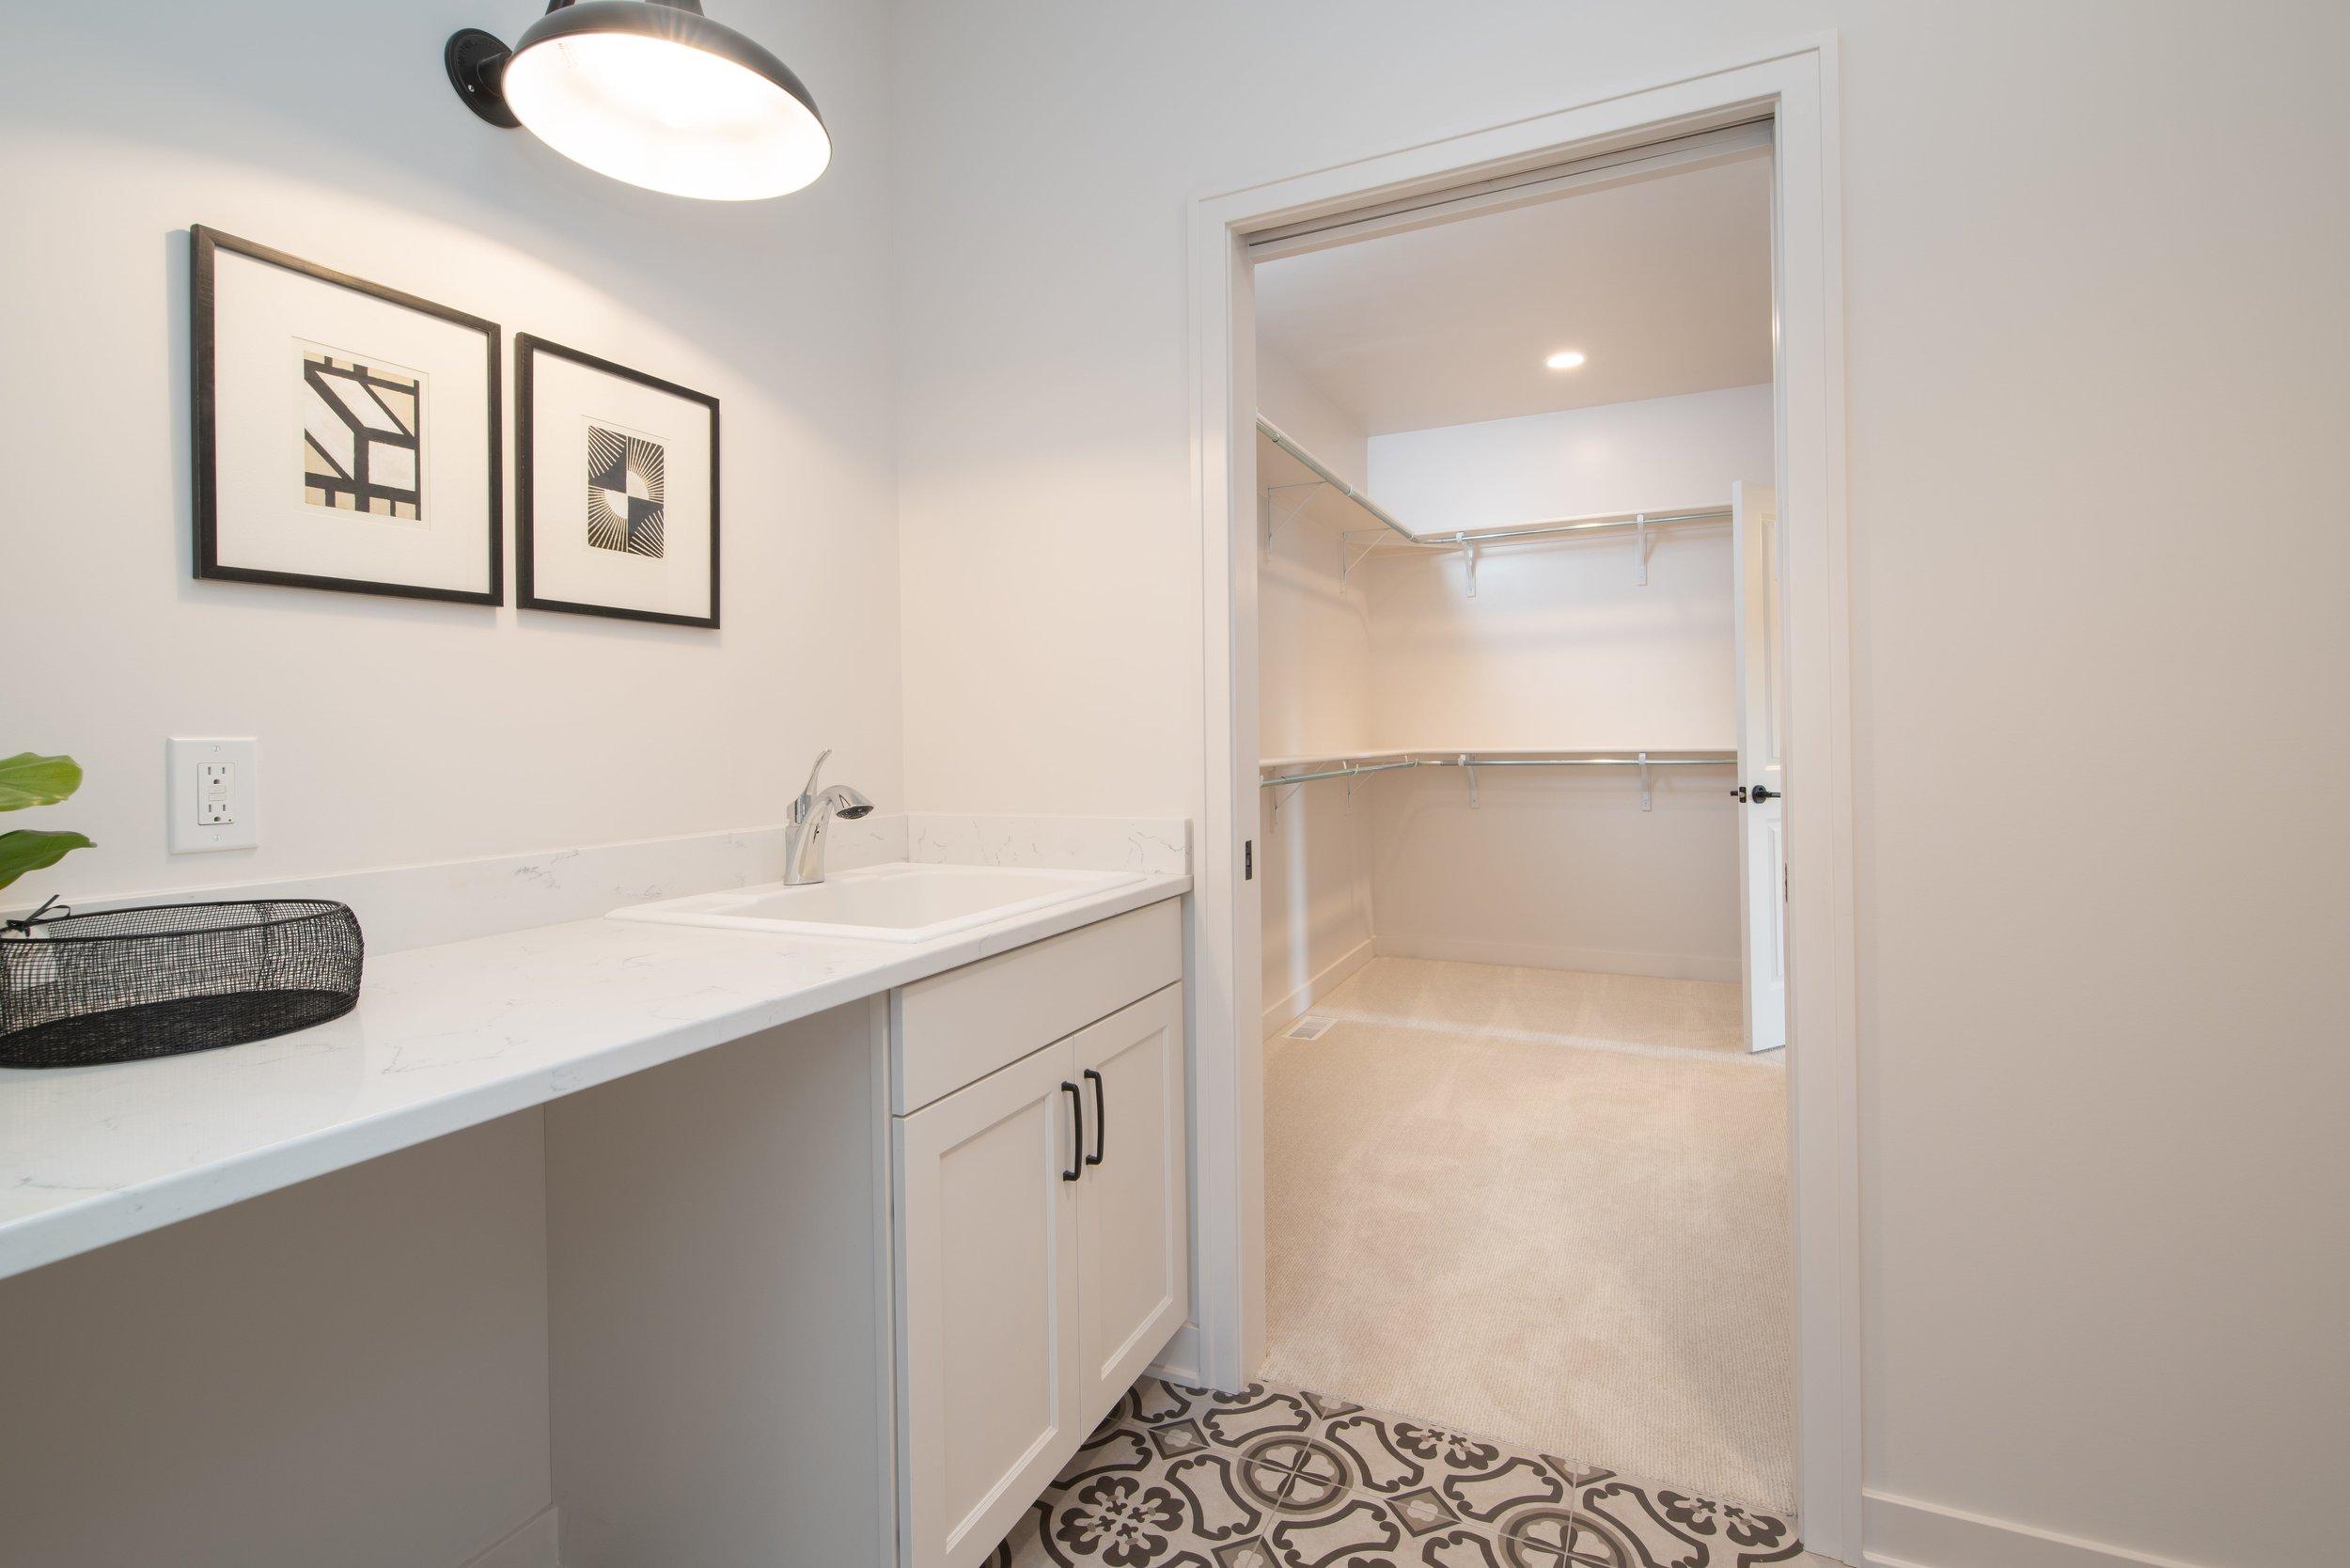 WW-04-110_Foxglove_Laundry_counter sink & walk-in closet-min.jpg